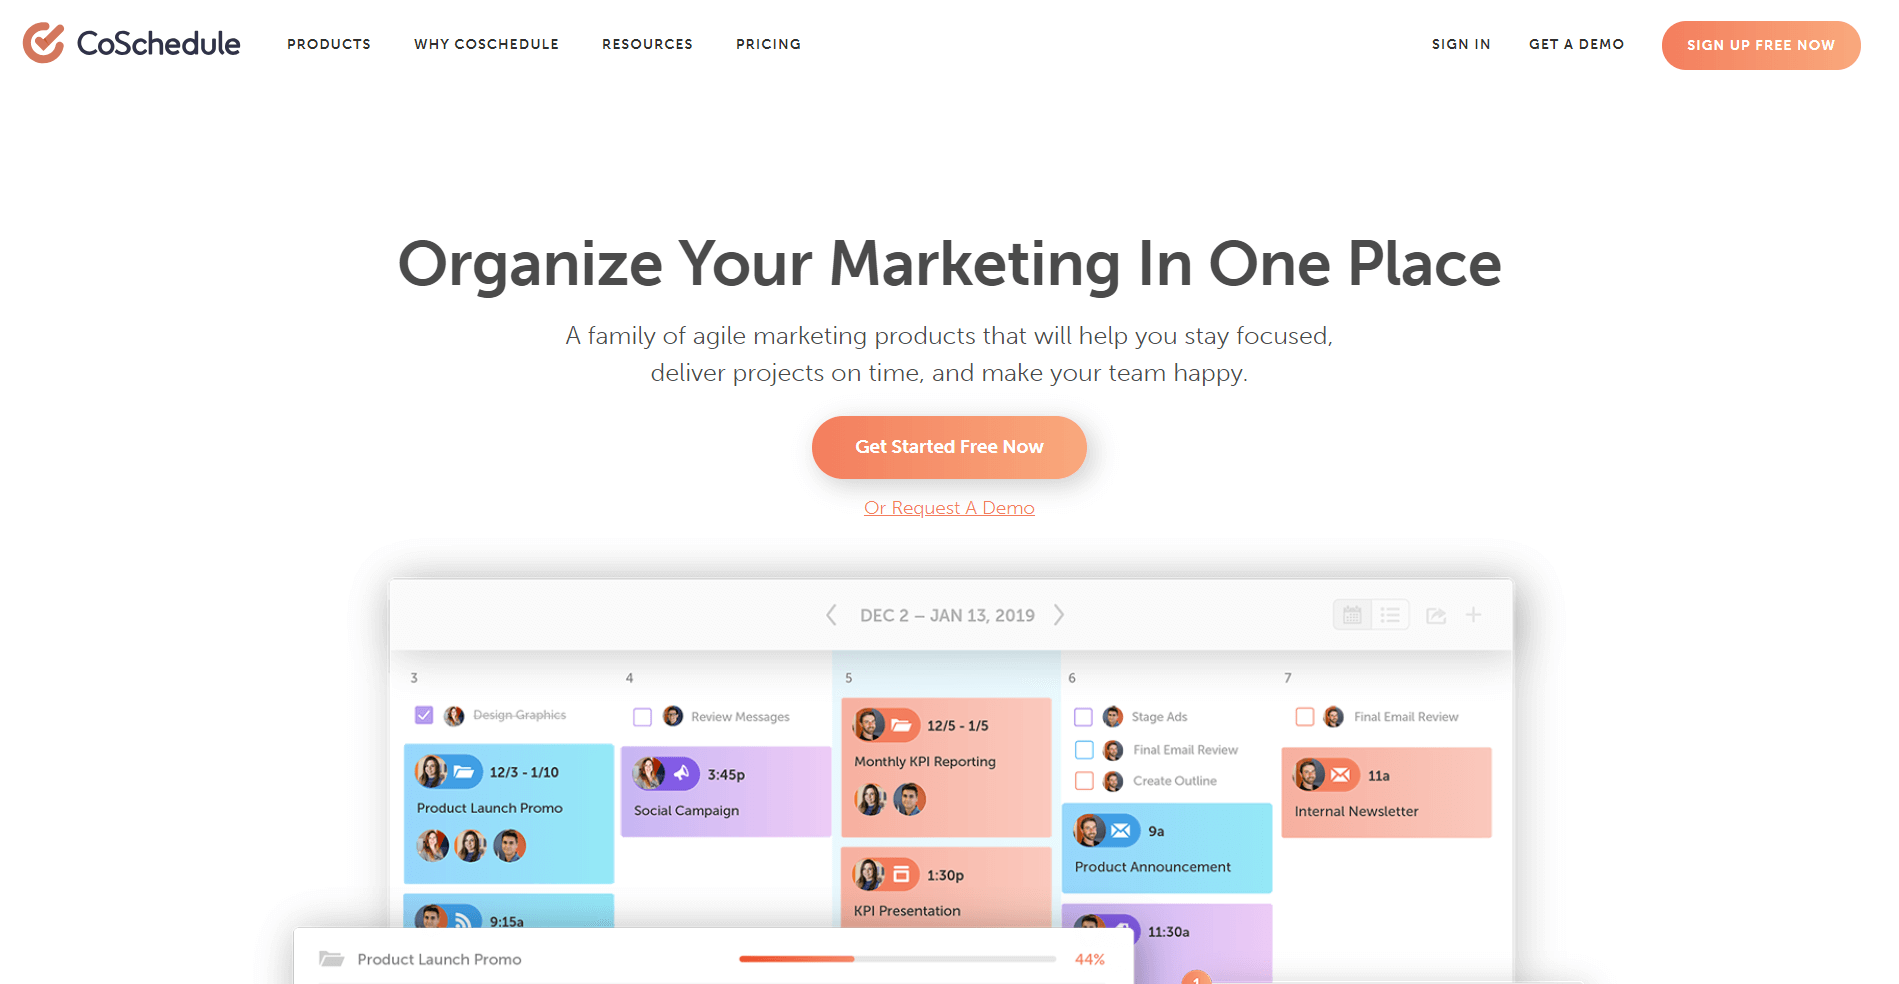 coschedule Content Marketing Platform